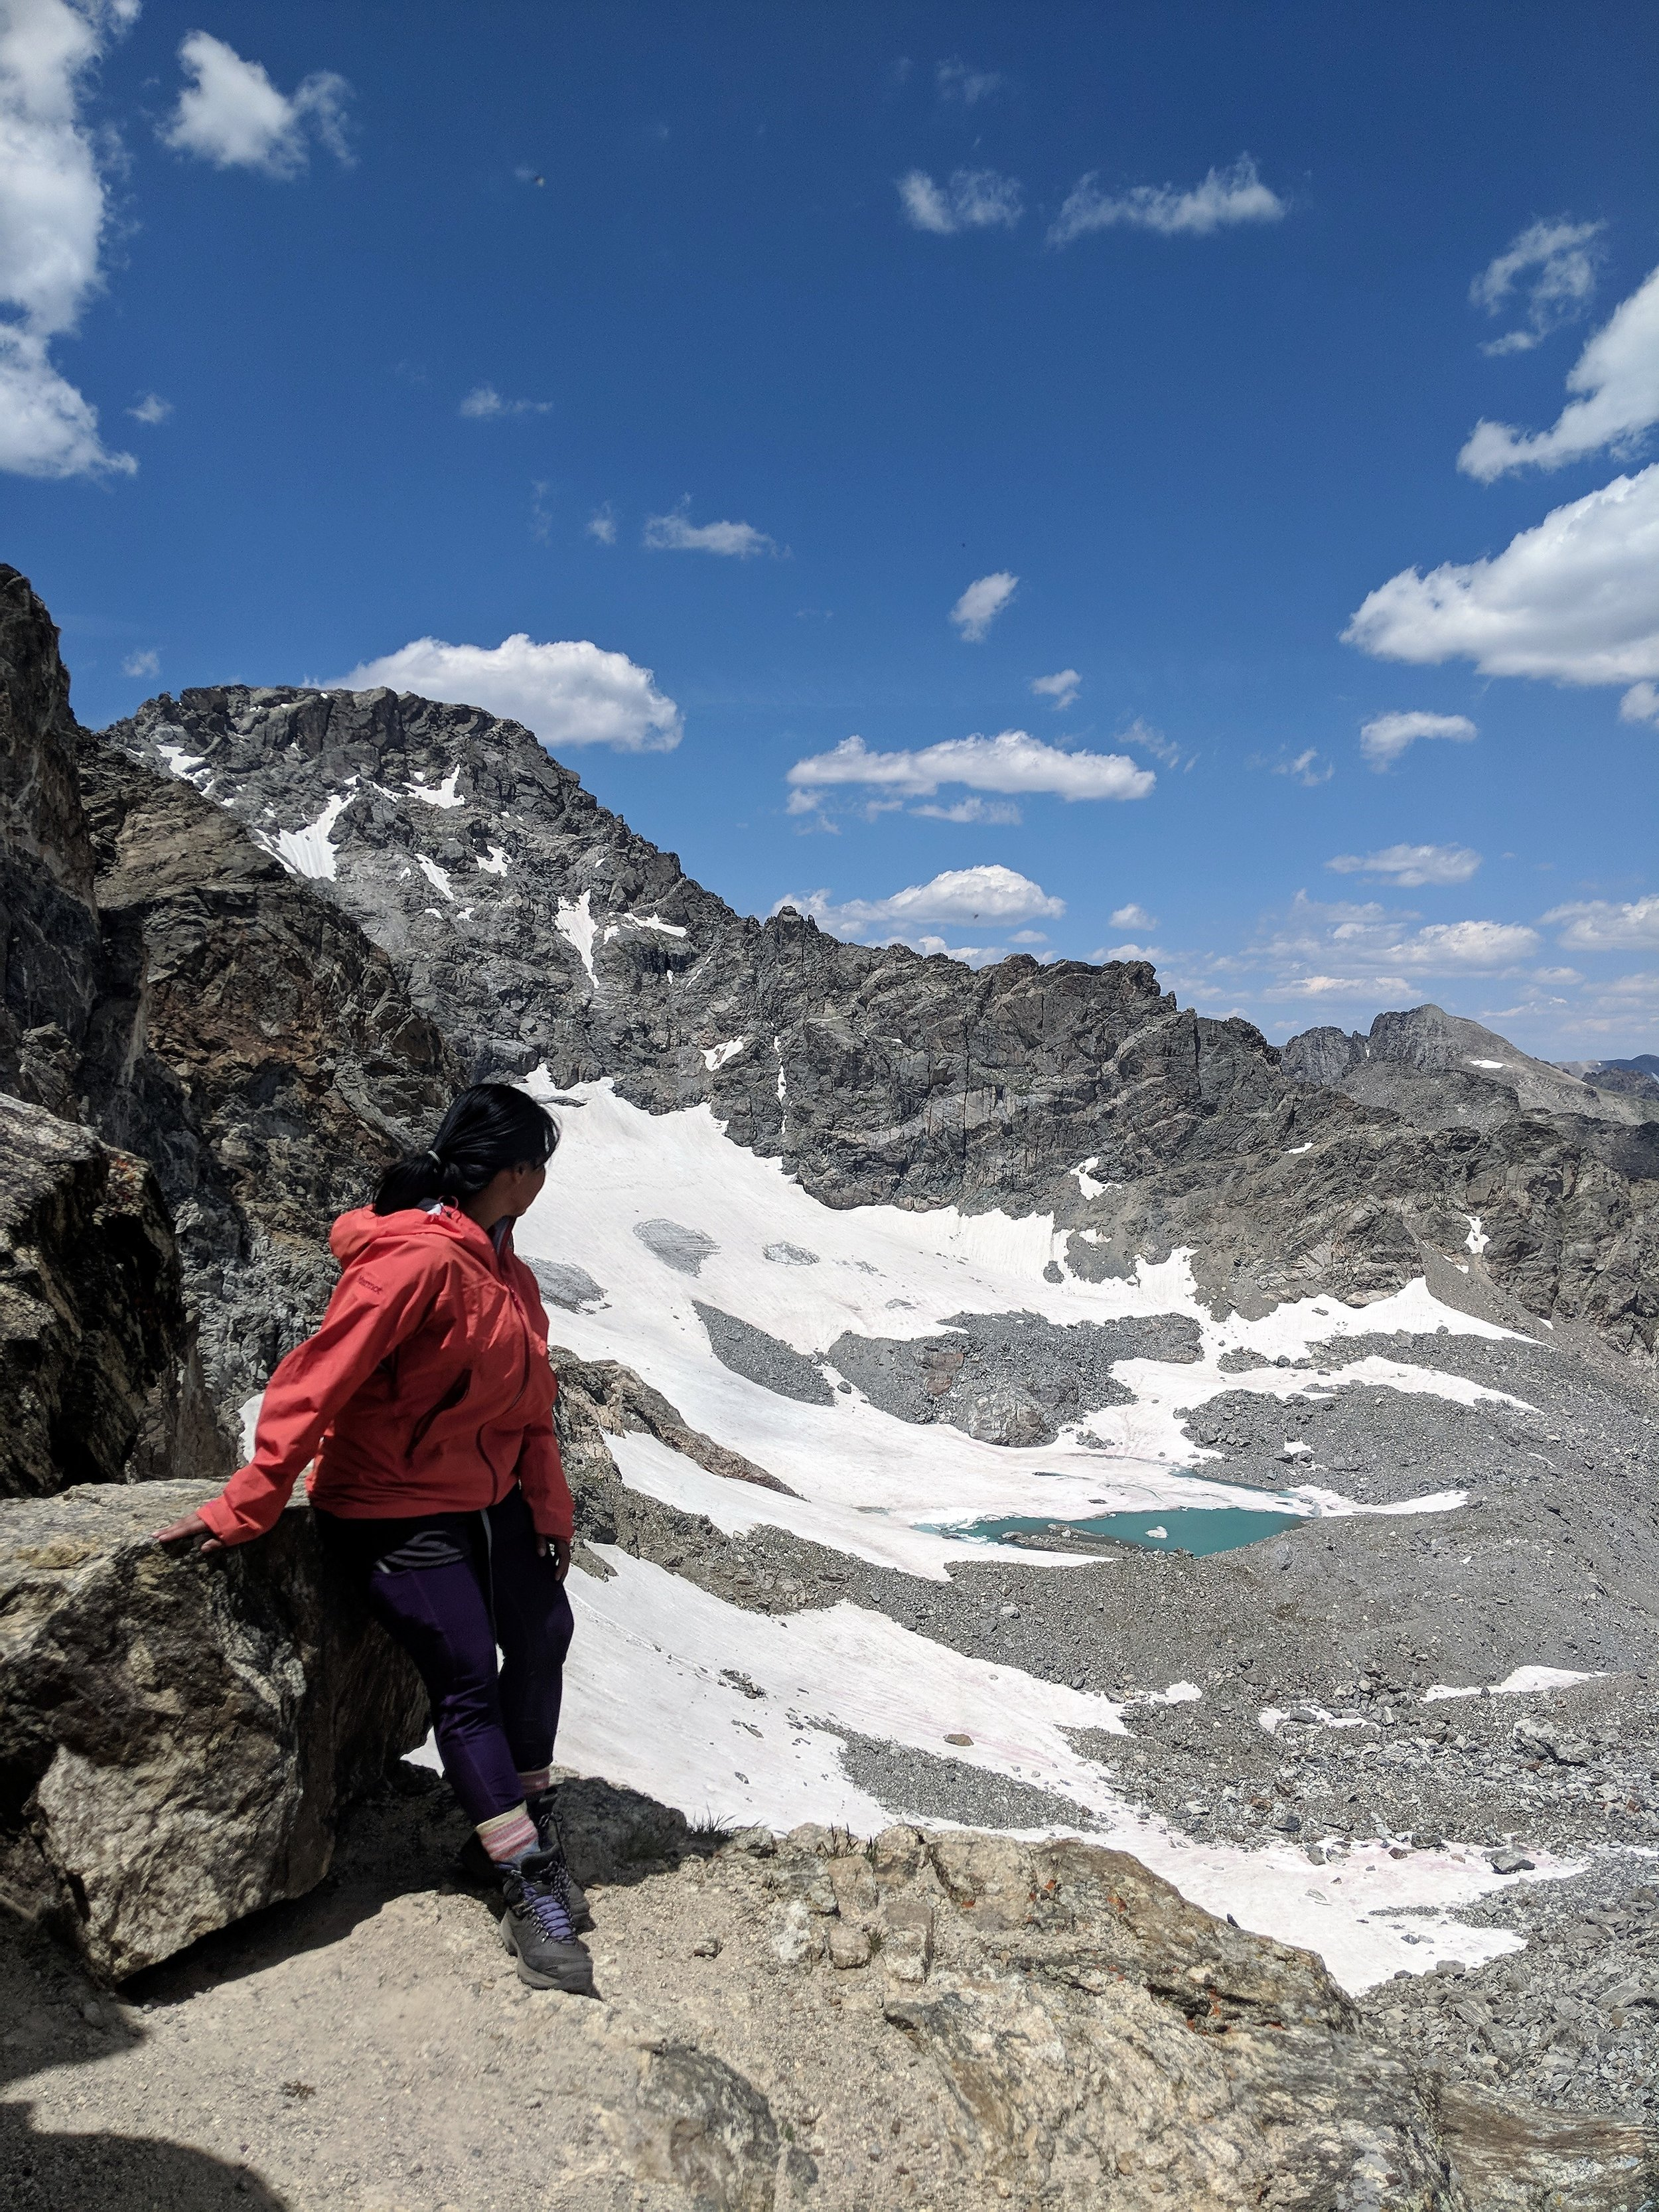 Training in Colorado's Indian Peaks Wilderness.